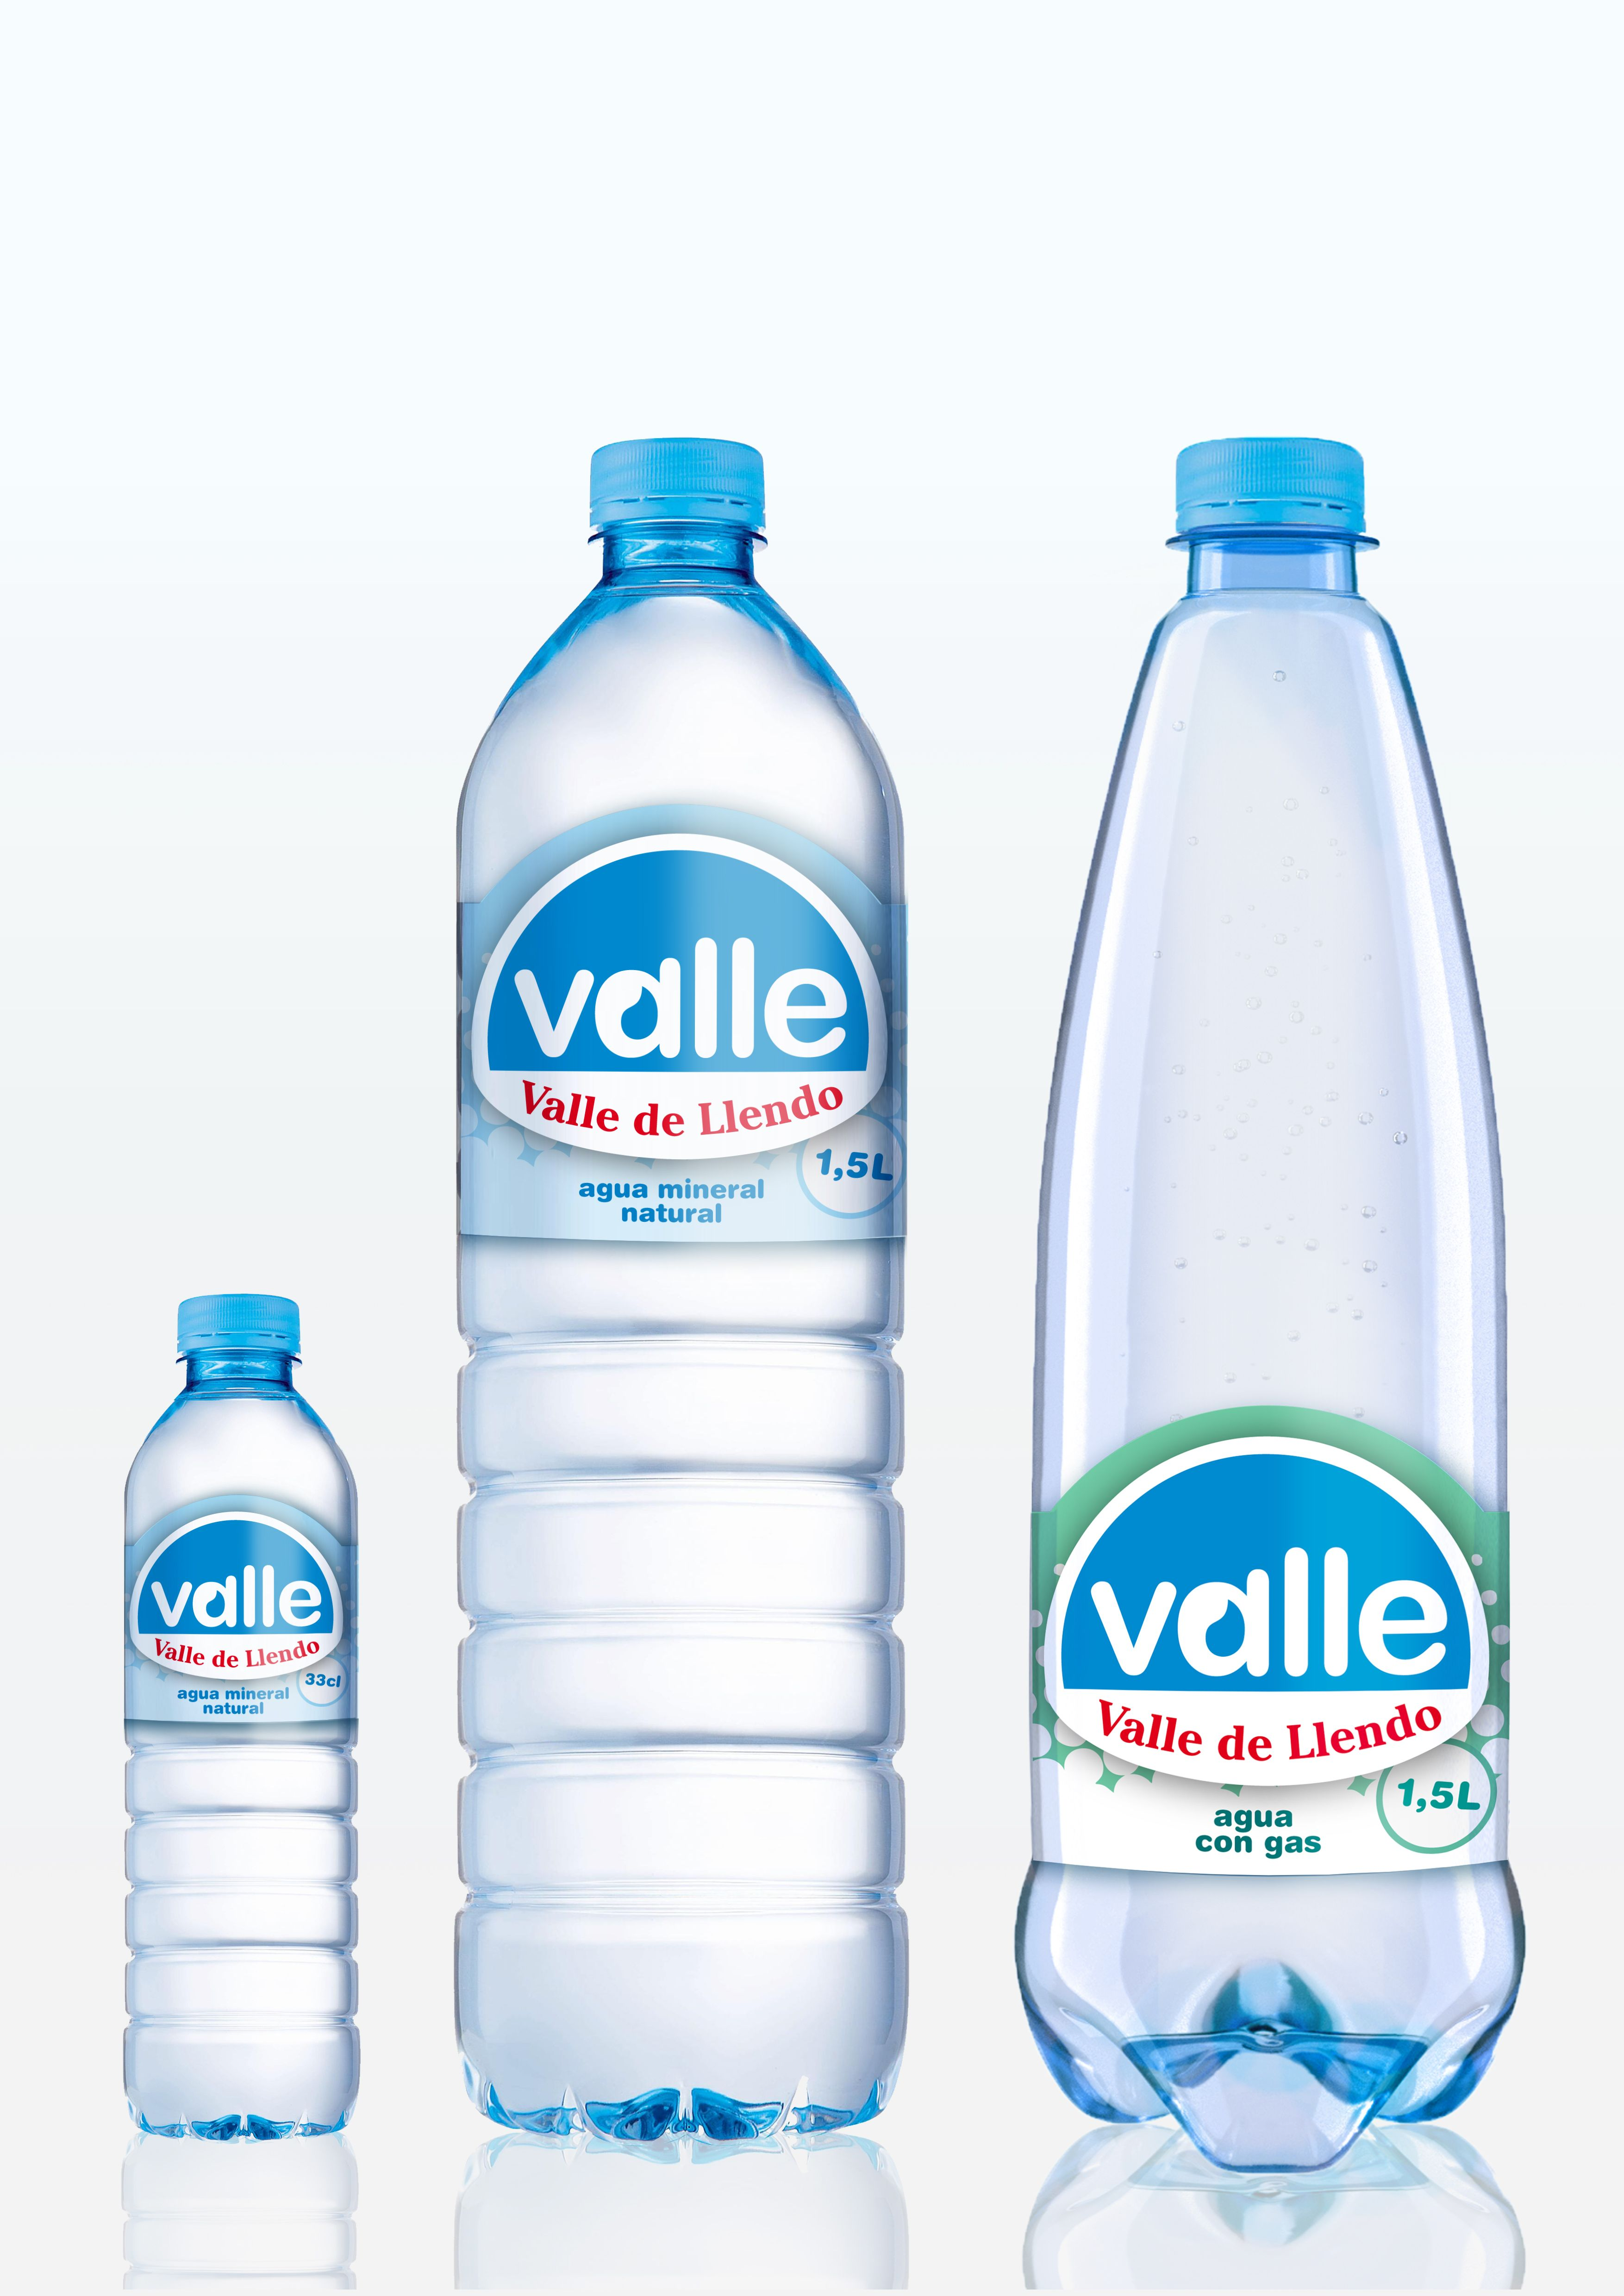 Diseno De Packaging Para Marca De Agua Bottle Design Water